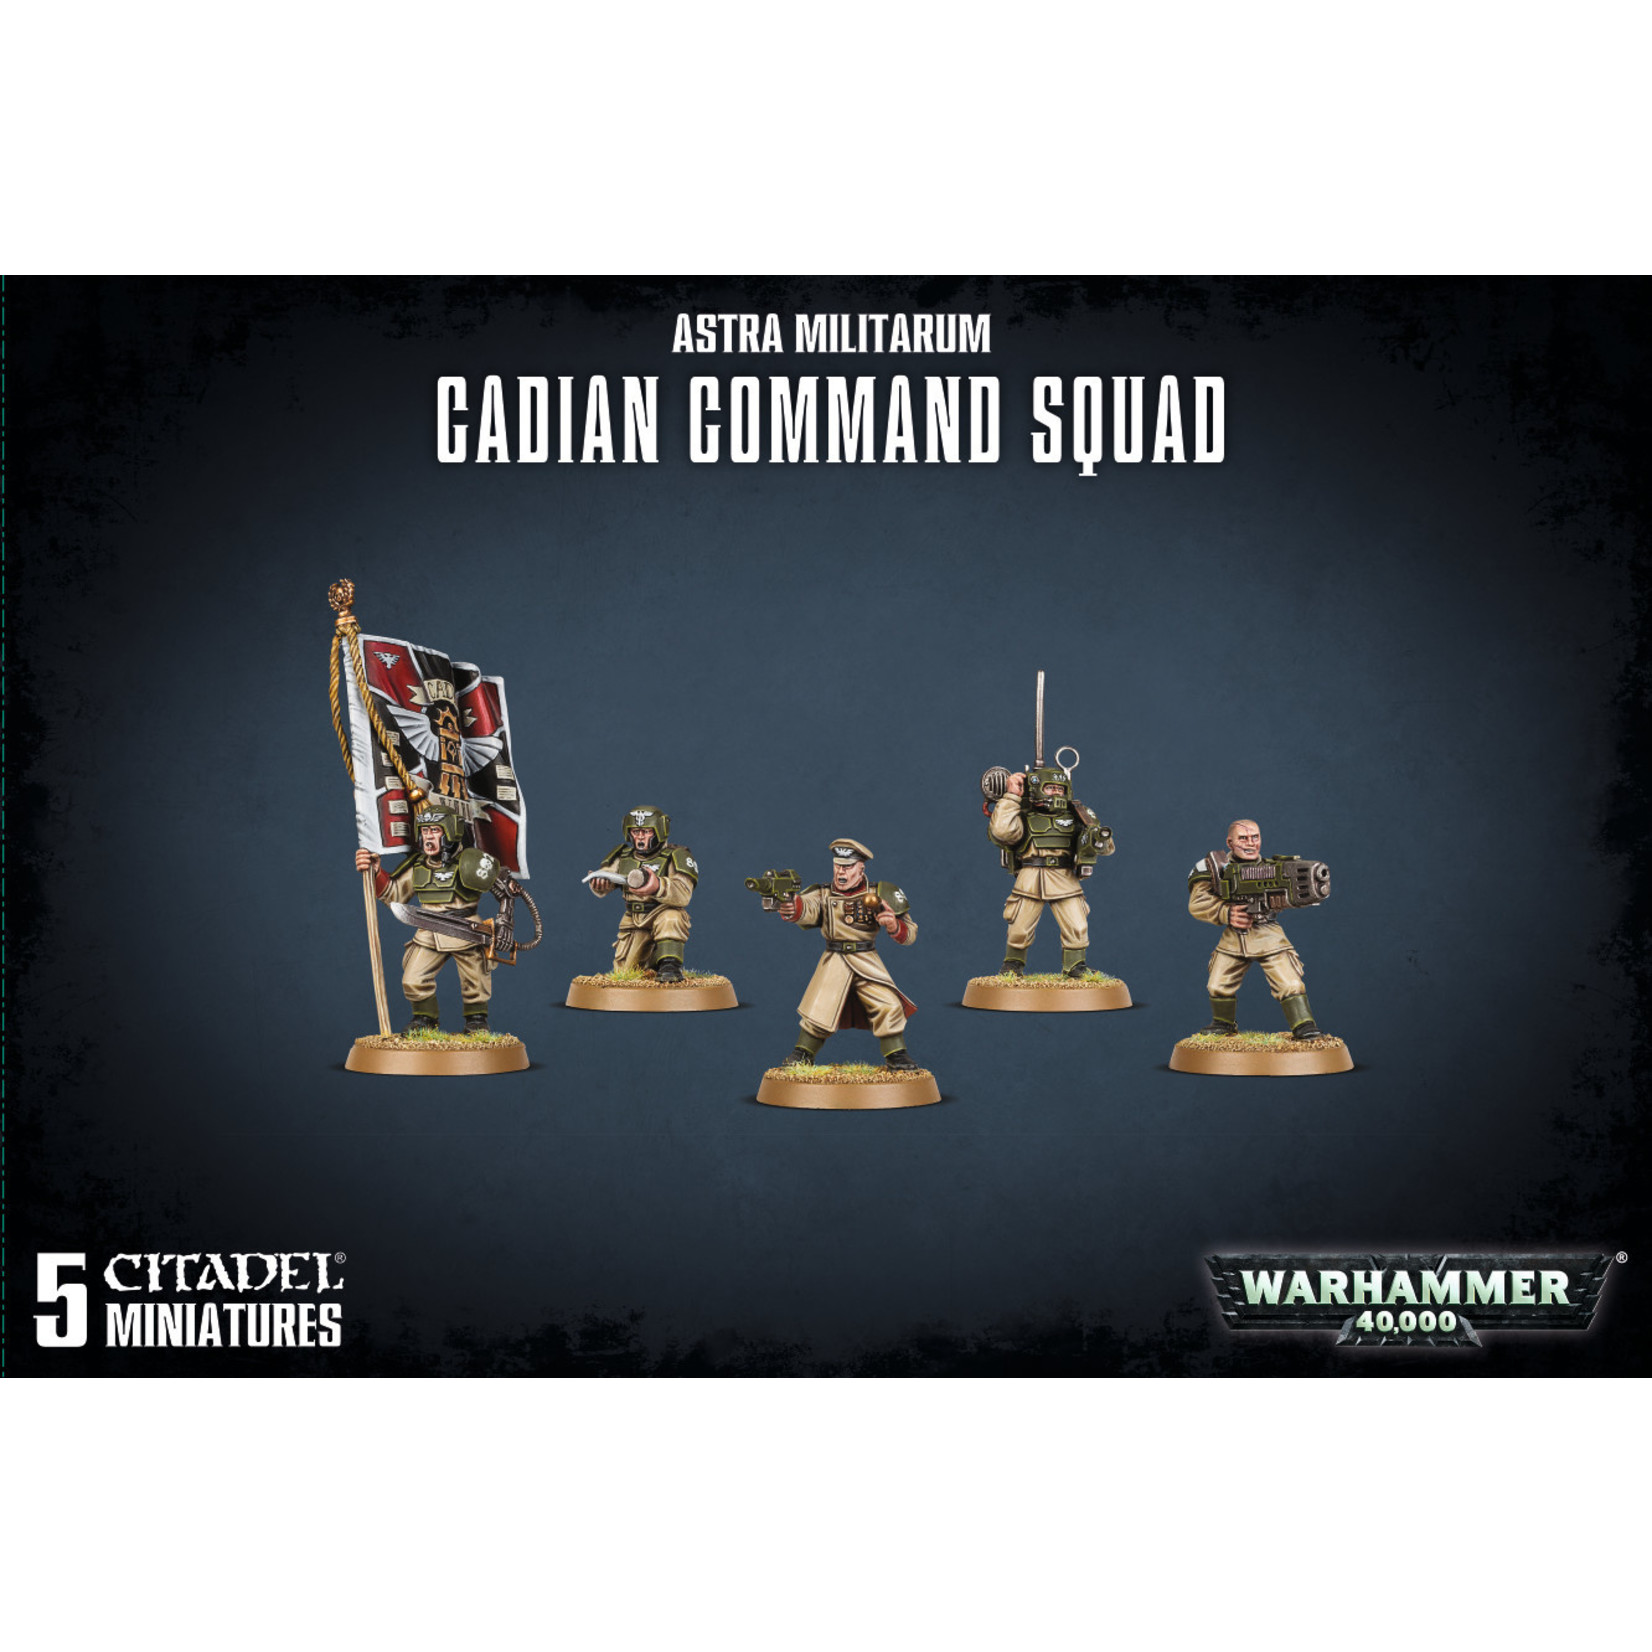 Warhammer 40K Astra Militarum - Cadian Command Squad